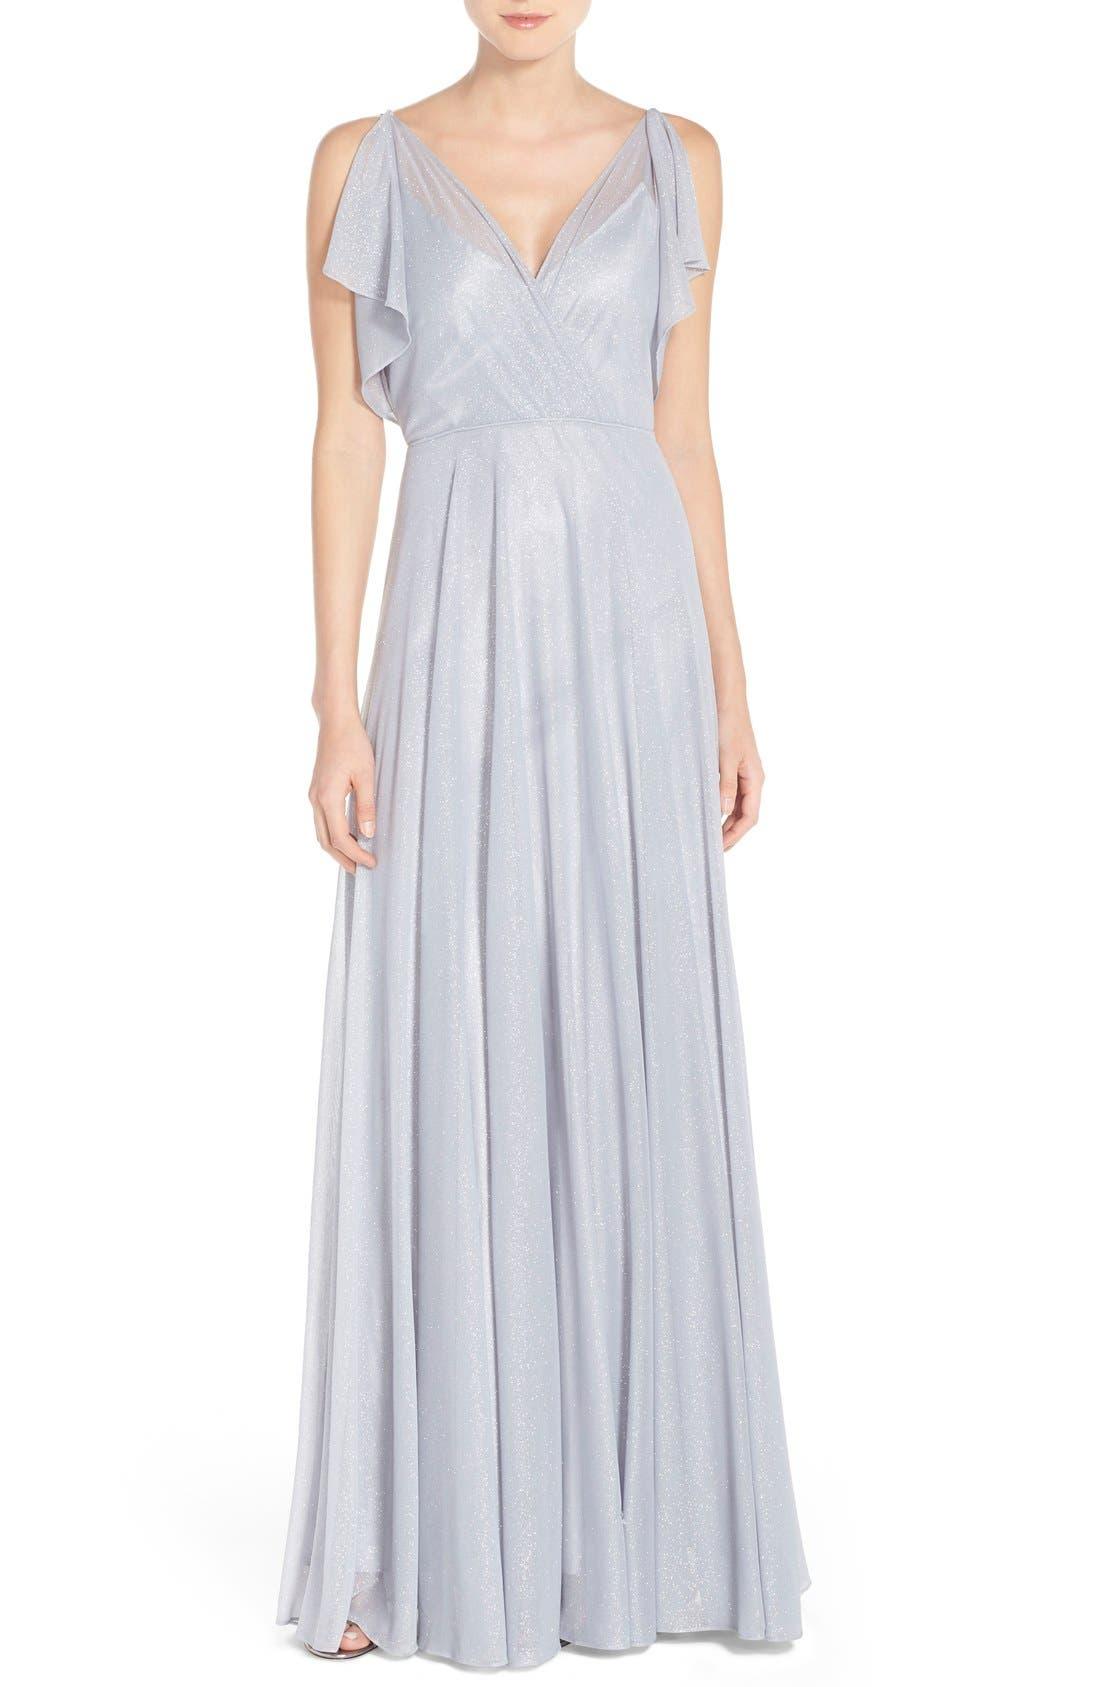 JENNY YOO 'Cassie' V-Neck Flutter Sleeve Shimmer Gown